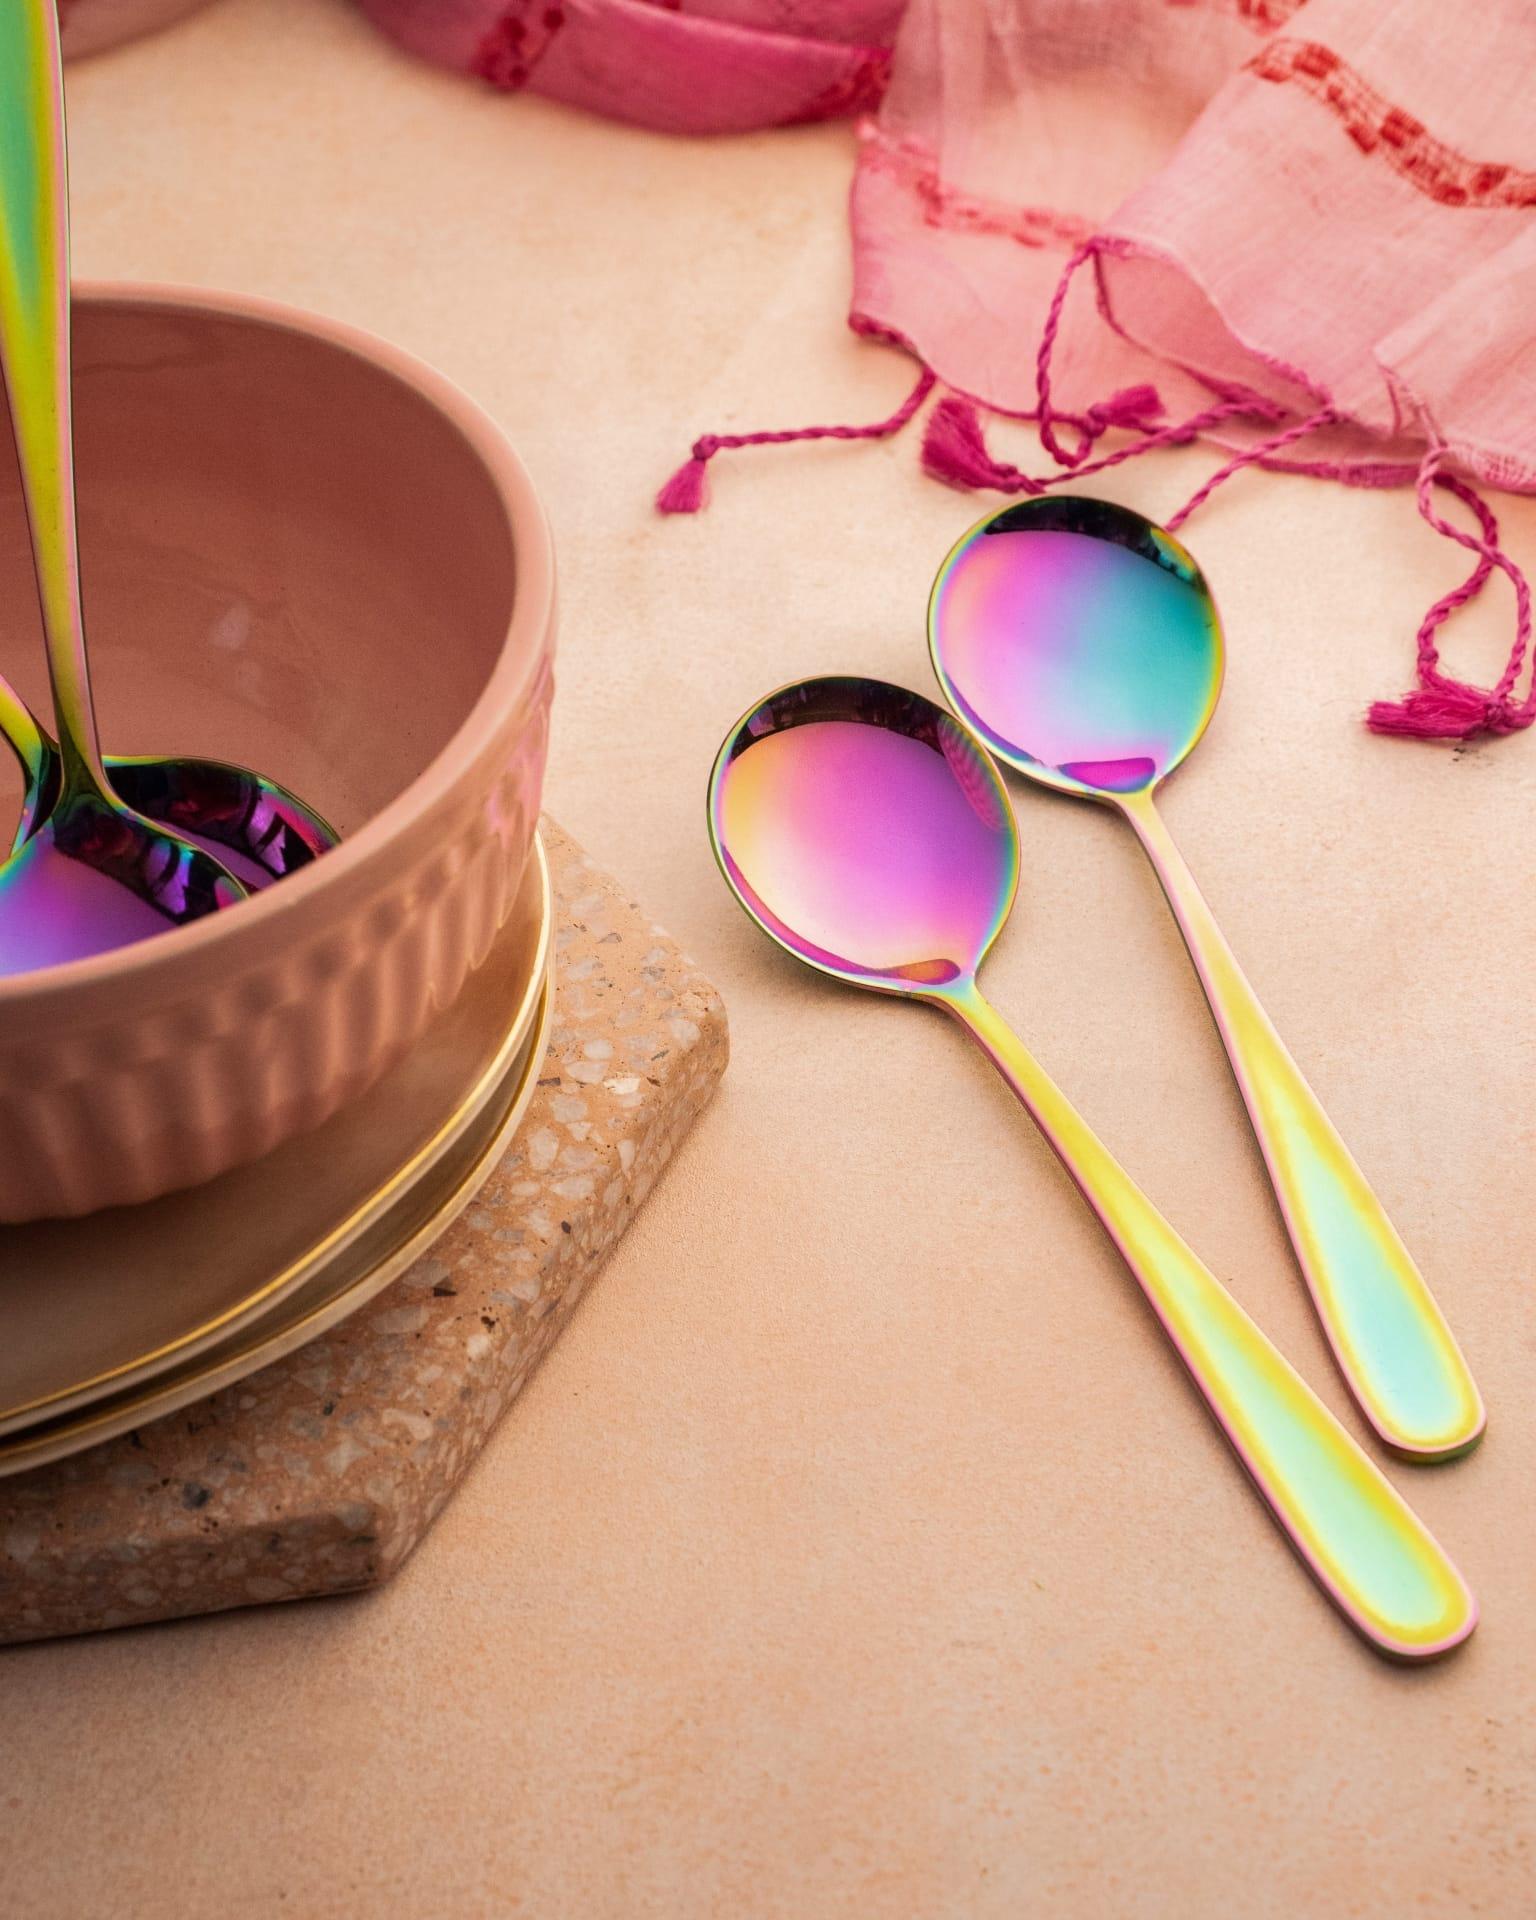 Viola Sassy Rounded Spoon